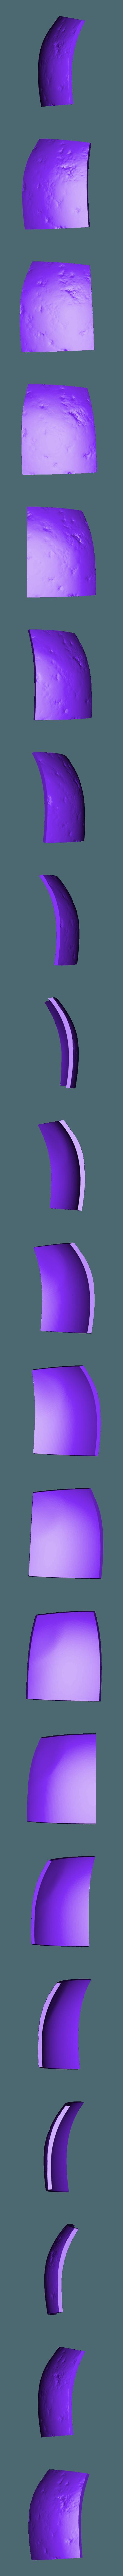 Armory_Damaged_Print16.obj Download OBJ file Armory - Knights of Ren Helmet (damaged), 3D print model • 3D print design, 3D-mon